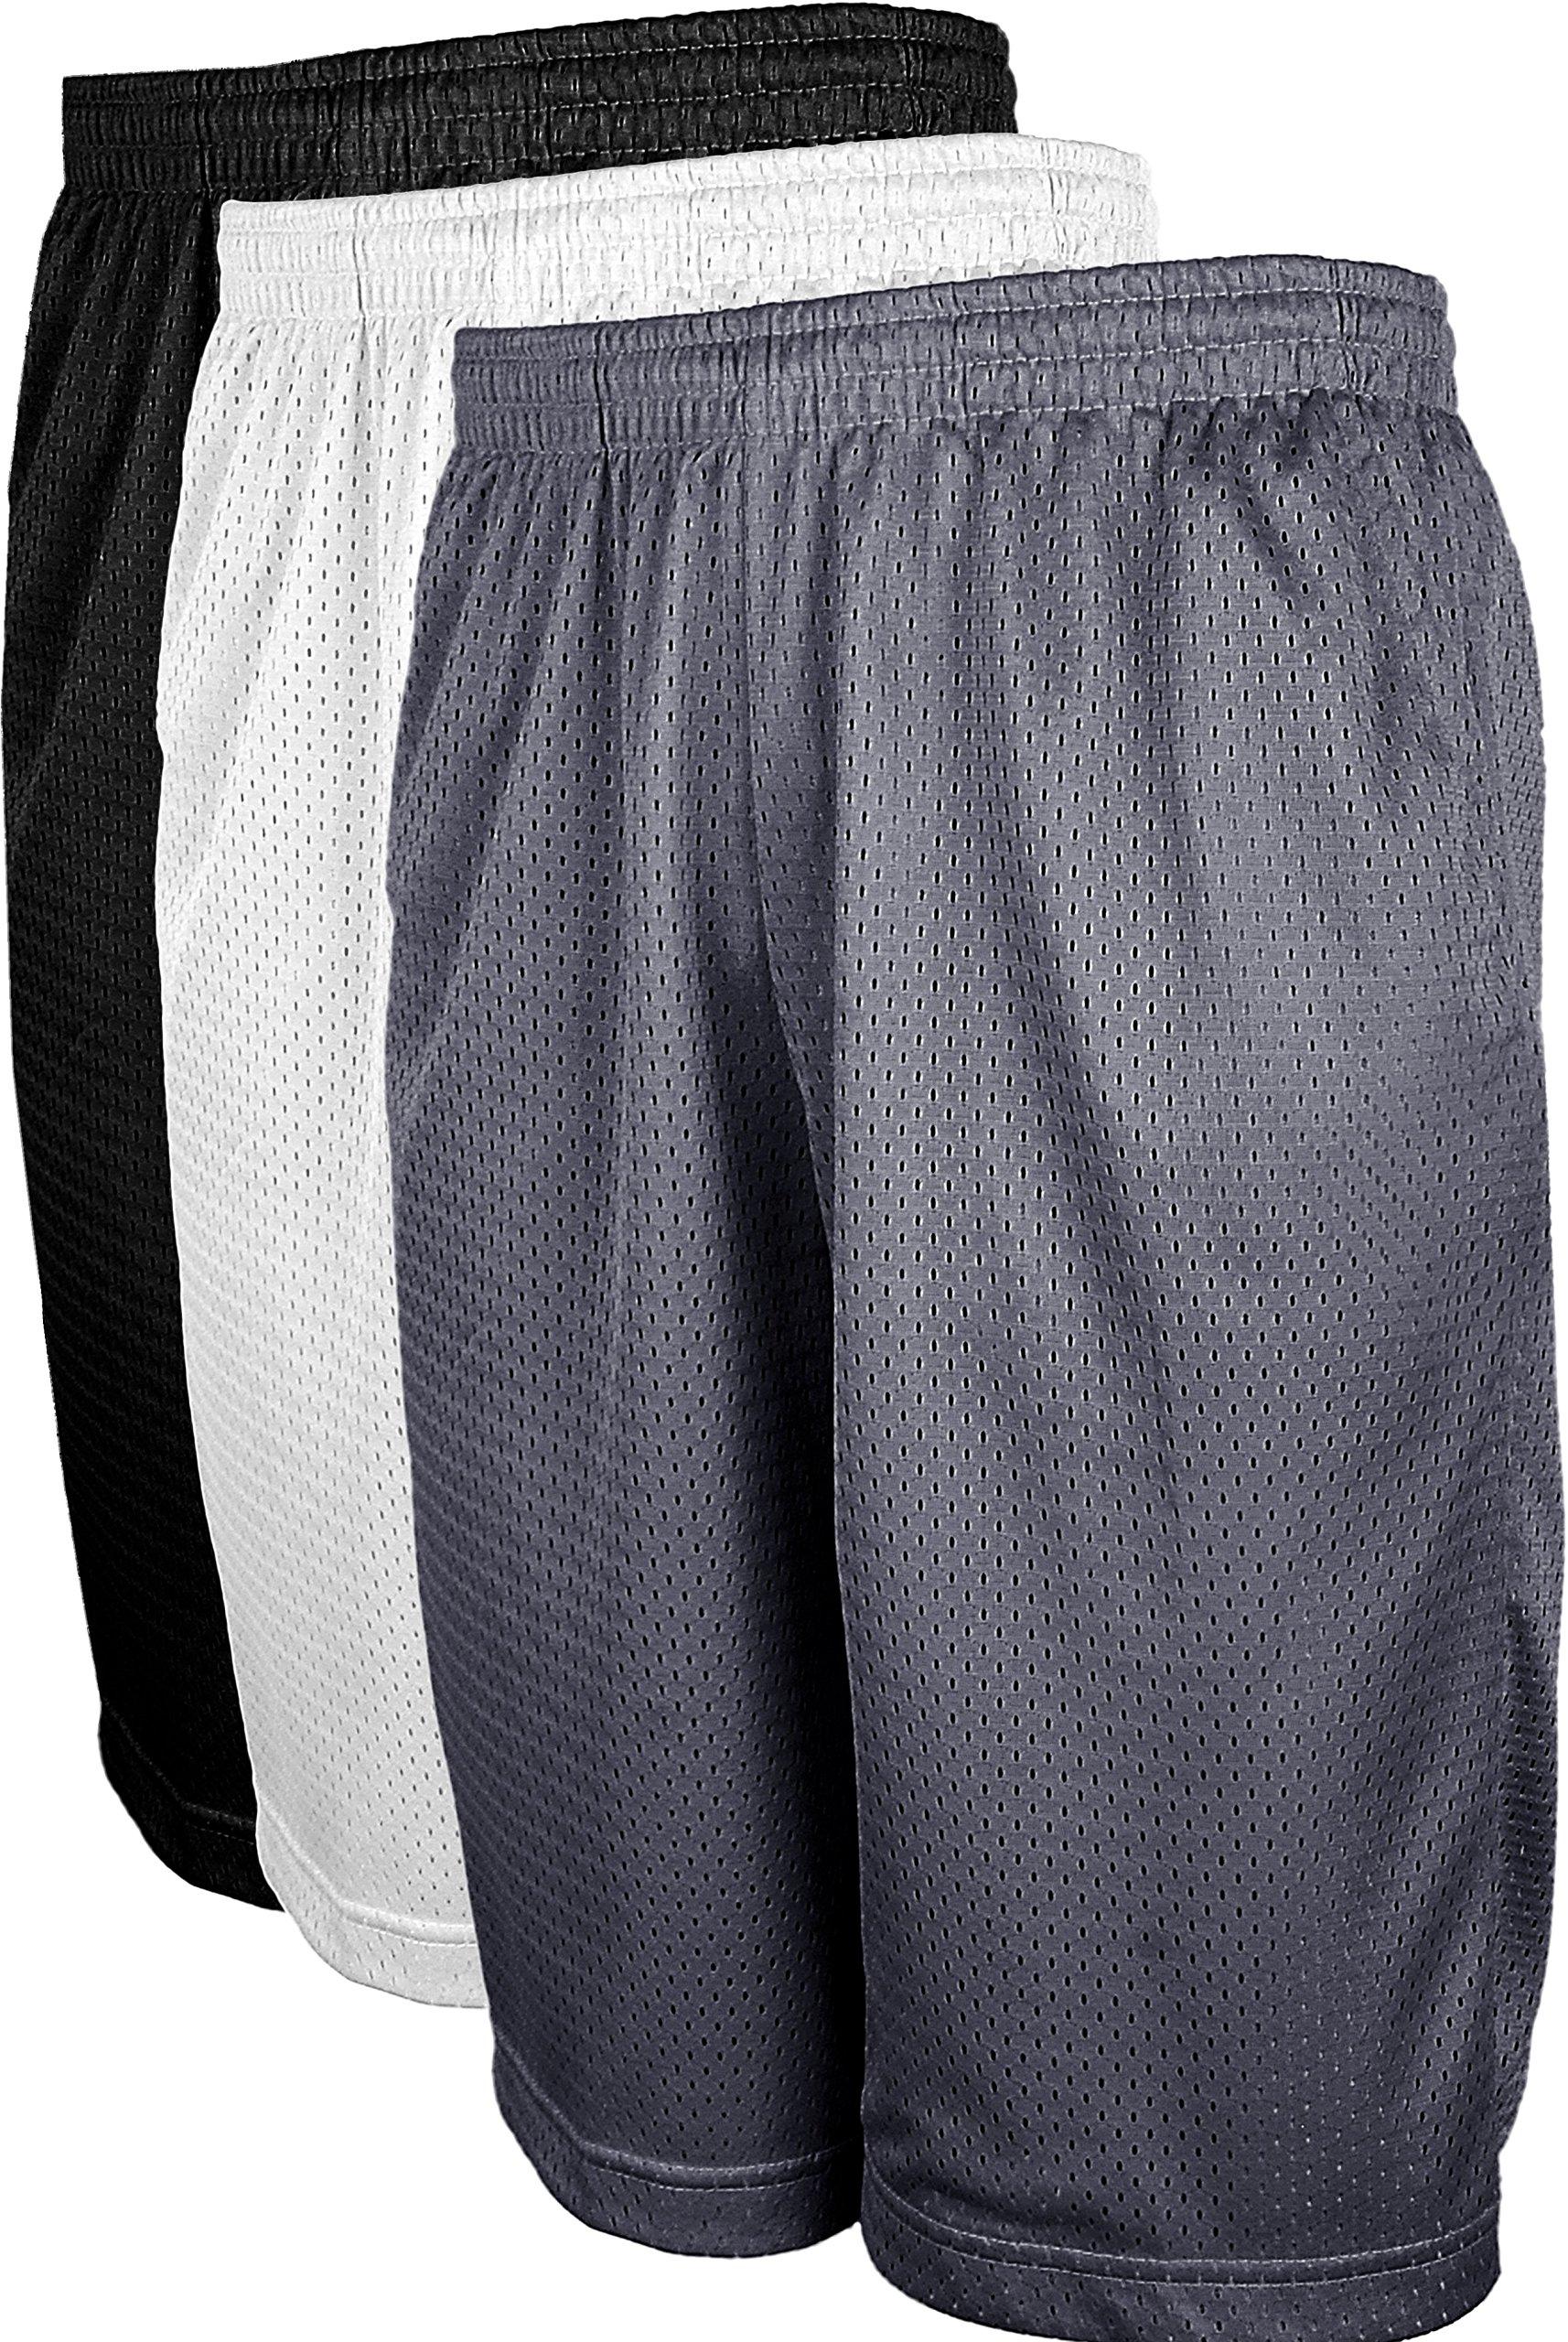 OLLIE ARNES Mesh Basketball Shorts for Men, Athletic Gym Workout Short with Pockets (S-6X) SET3_BLK_WHT_DKGREY 3XL